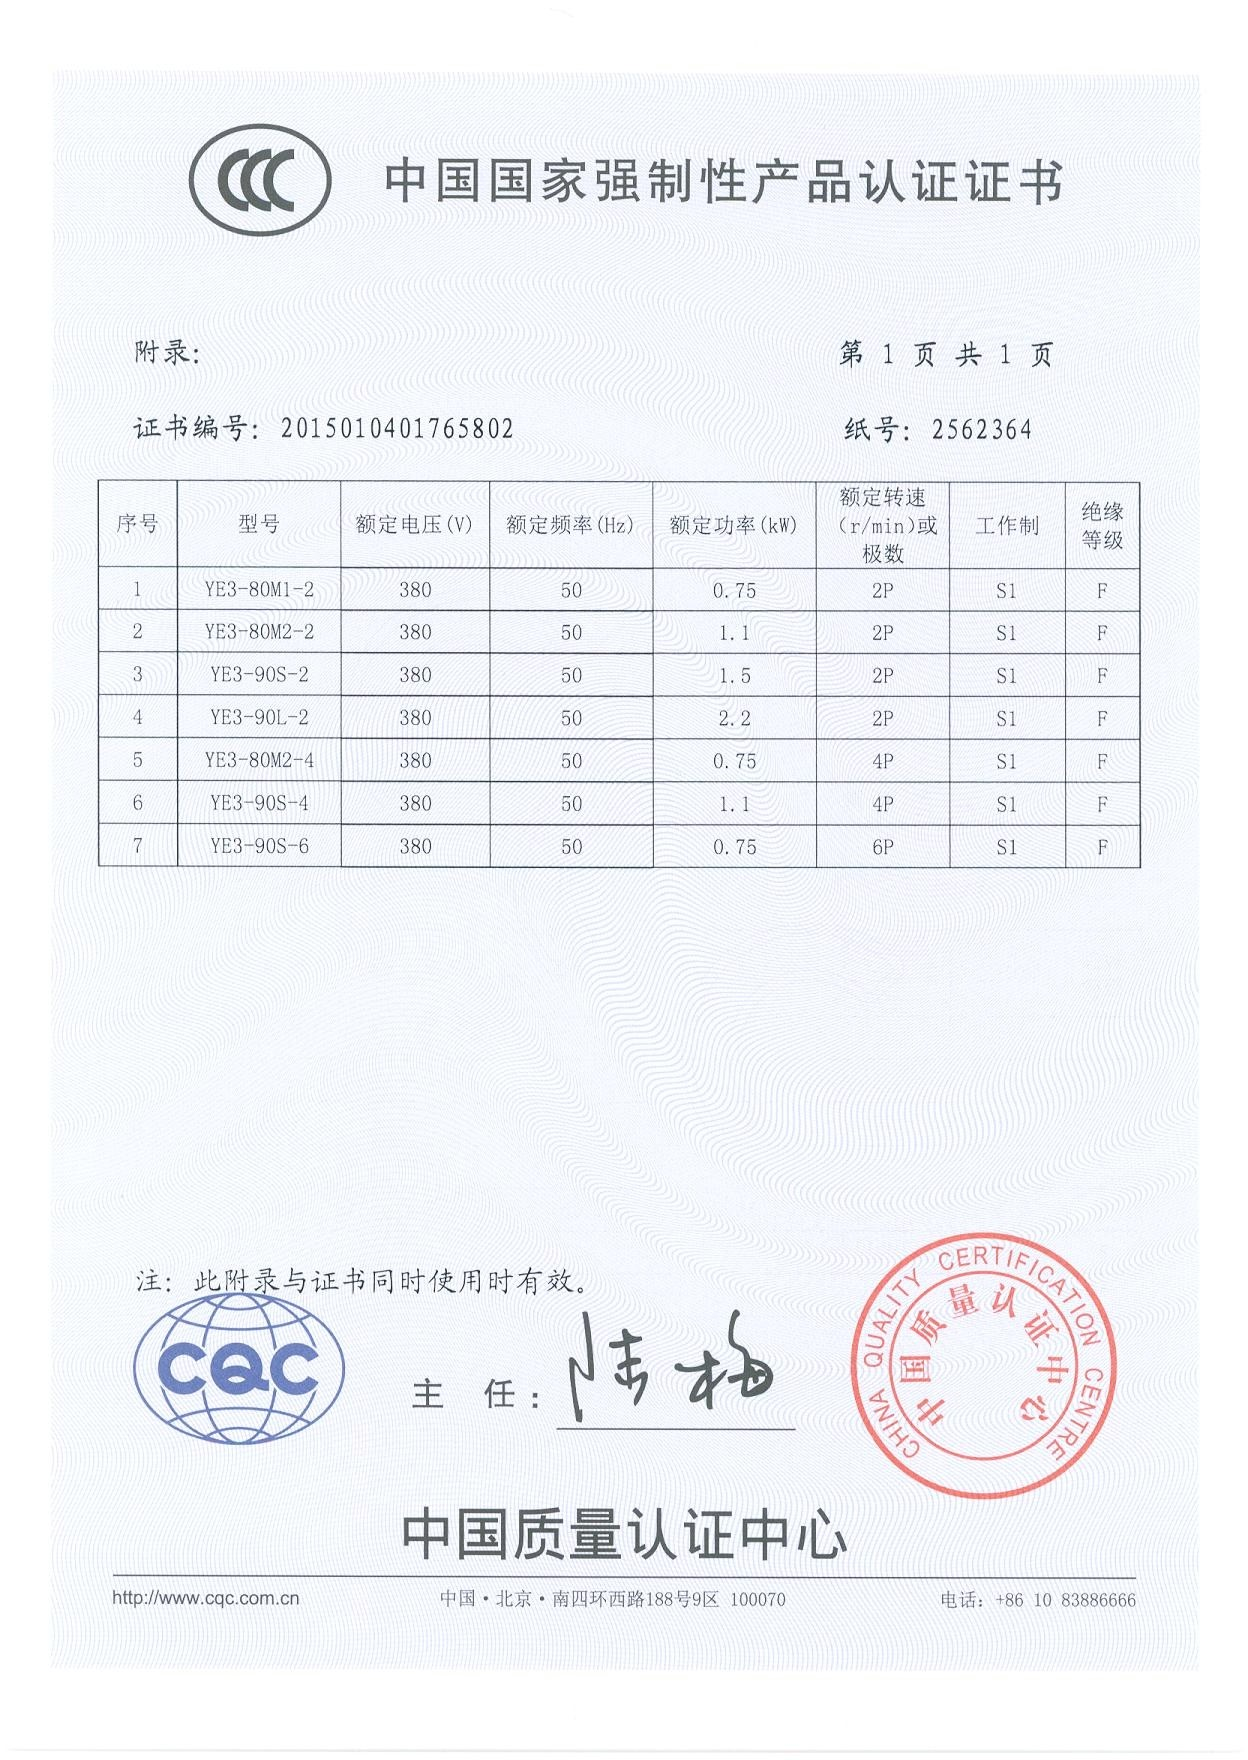 YE2-高效3C认证书 2